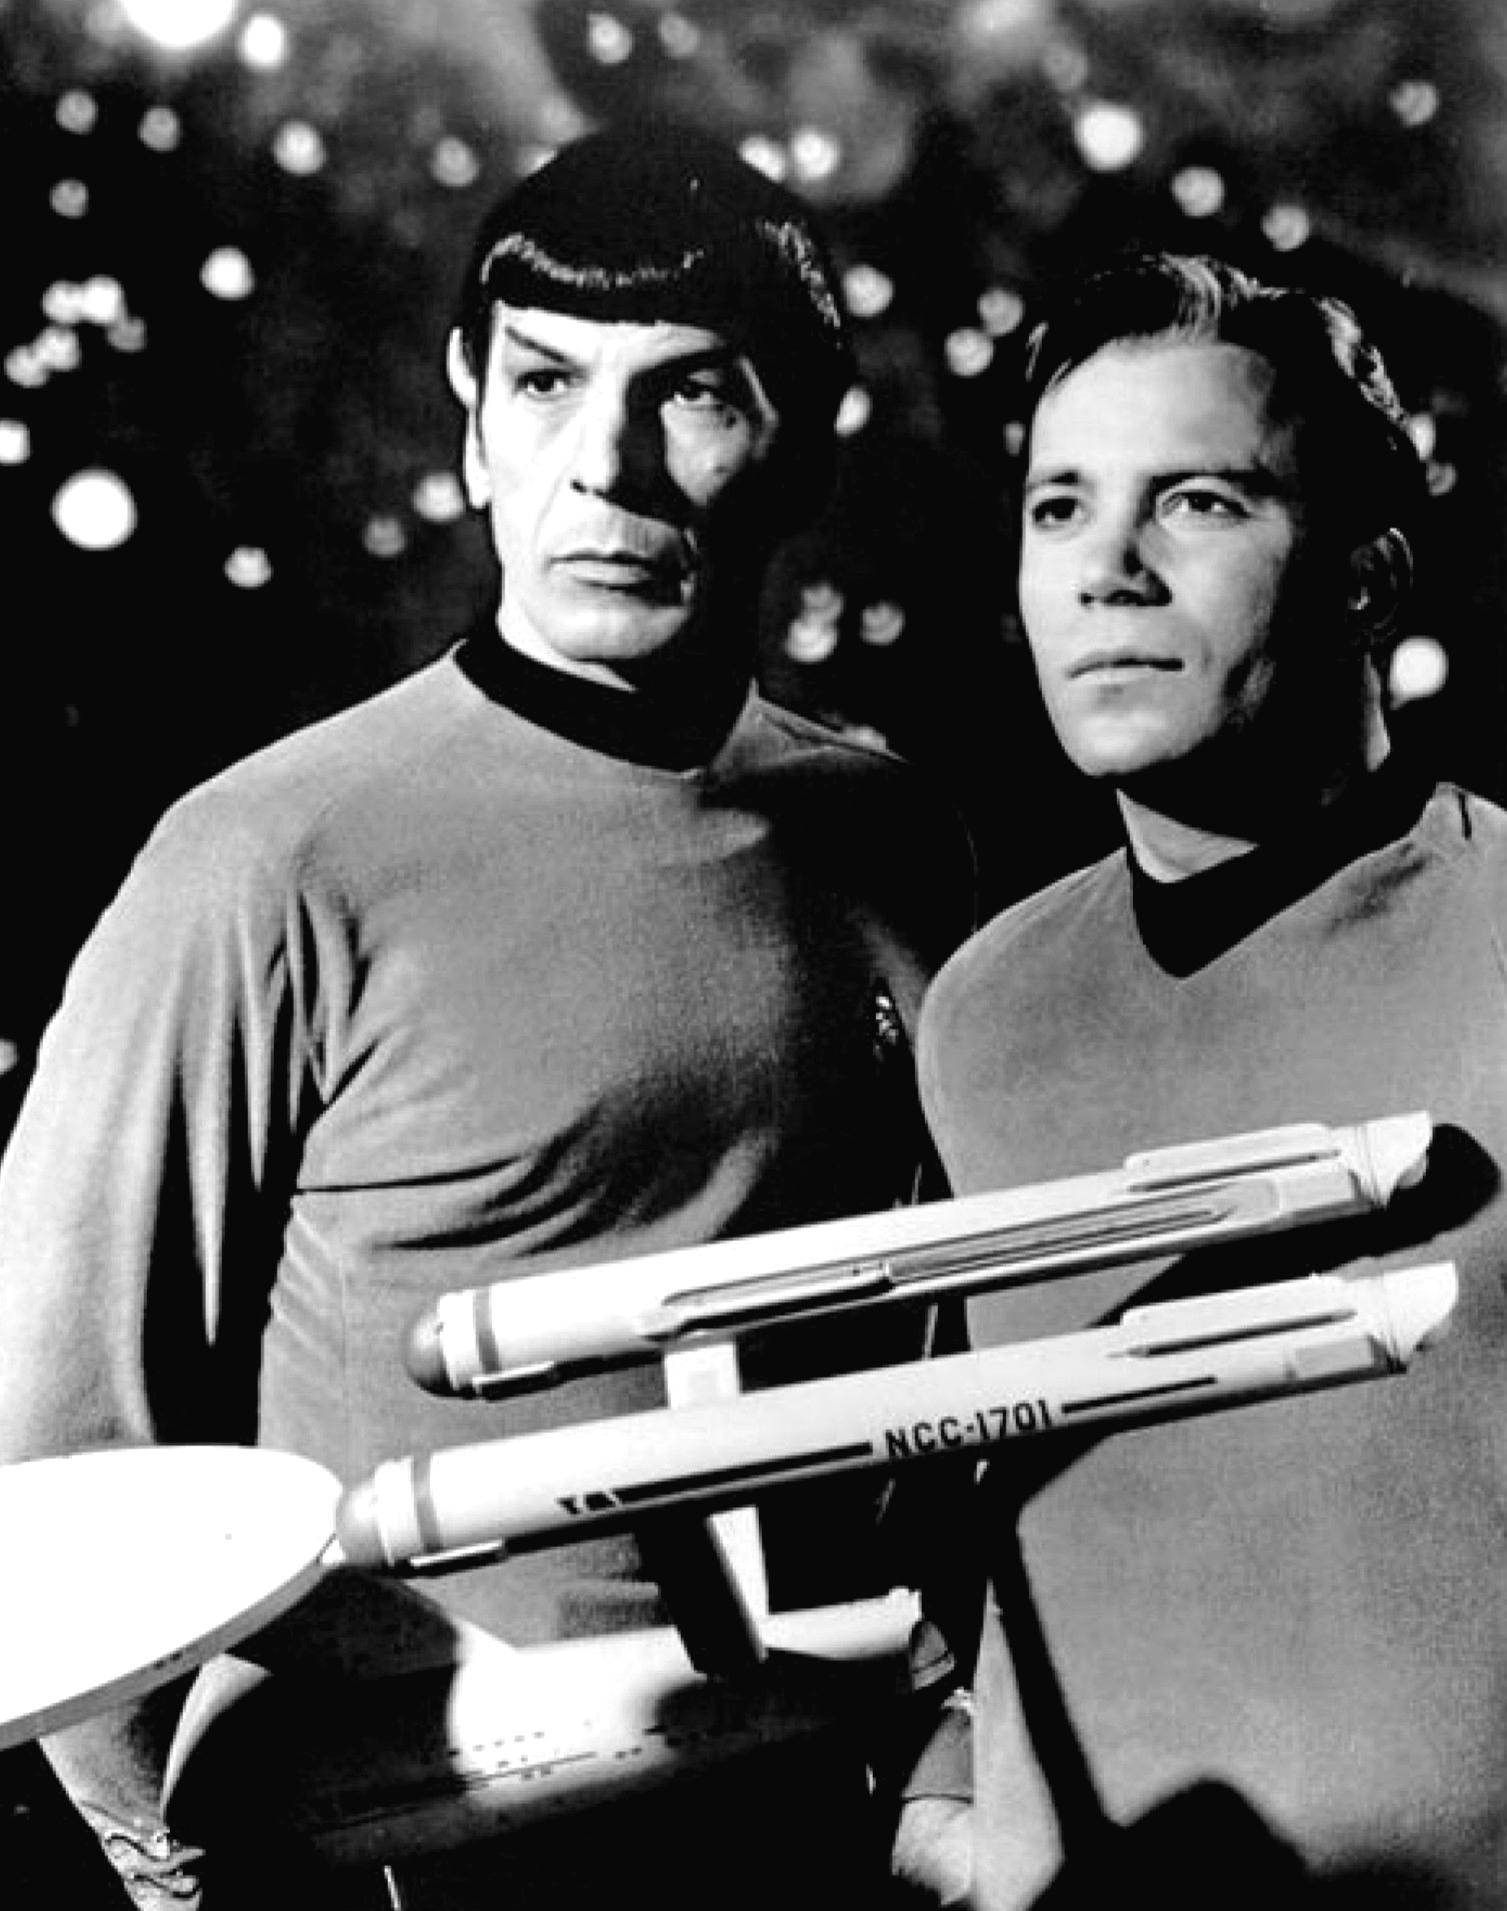 Serie Science Fiction Année 2000 : serie, science, fiction, année, Série, Télévisée, Science-fiction, Wikipédia